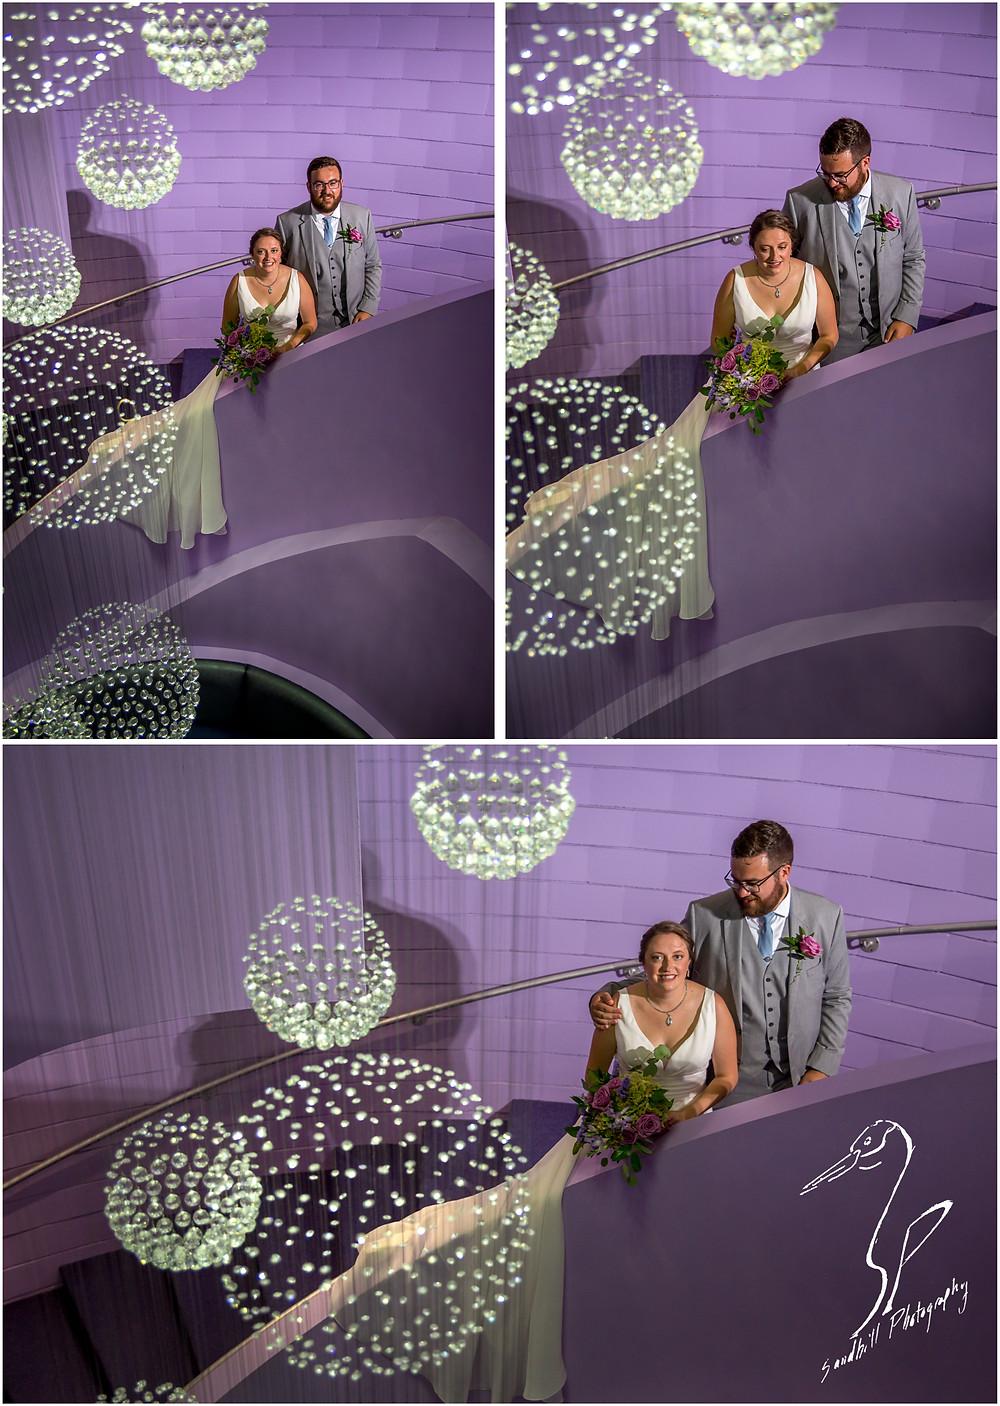 Van Wezel Wedding Photography, Bridal portraits inside the performing arts hall in Sarasota